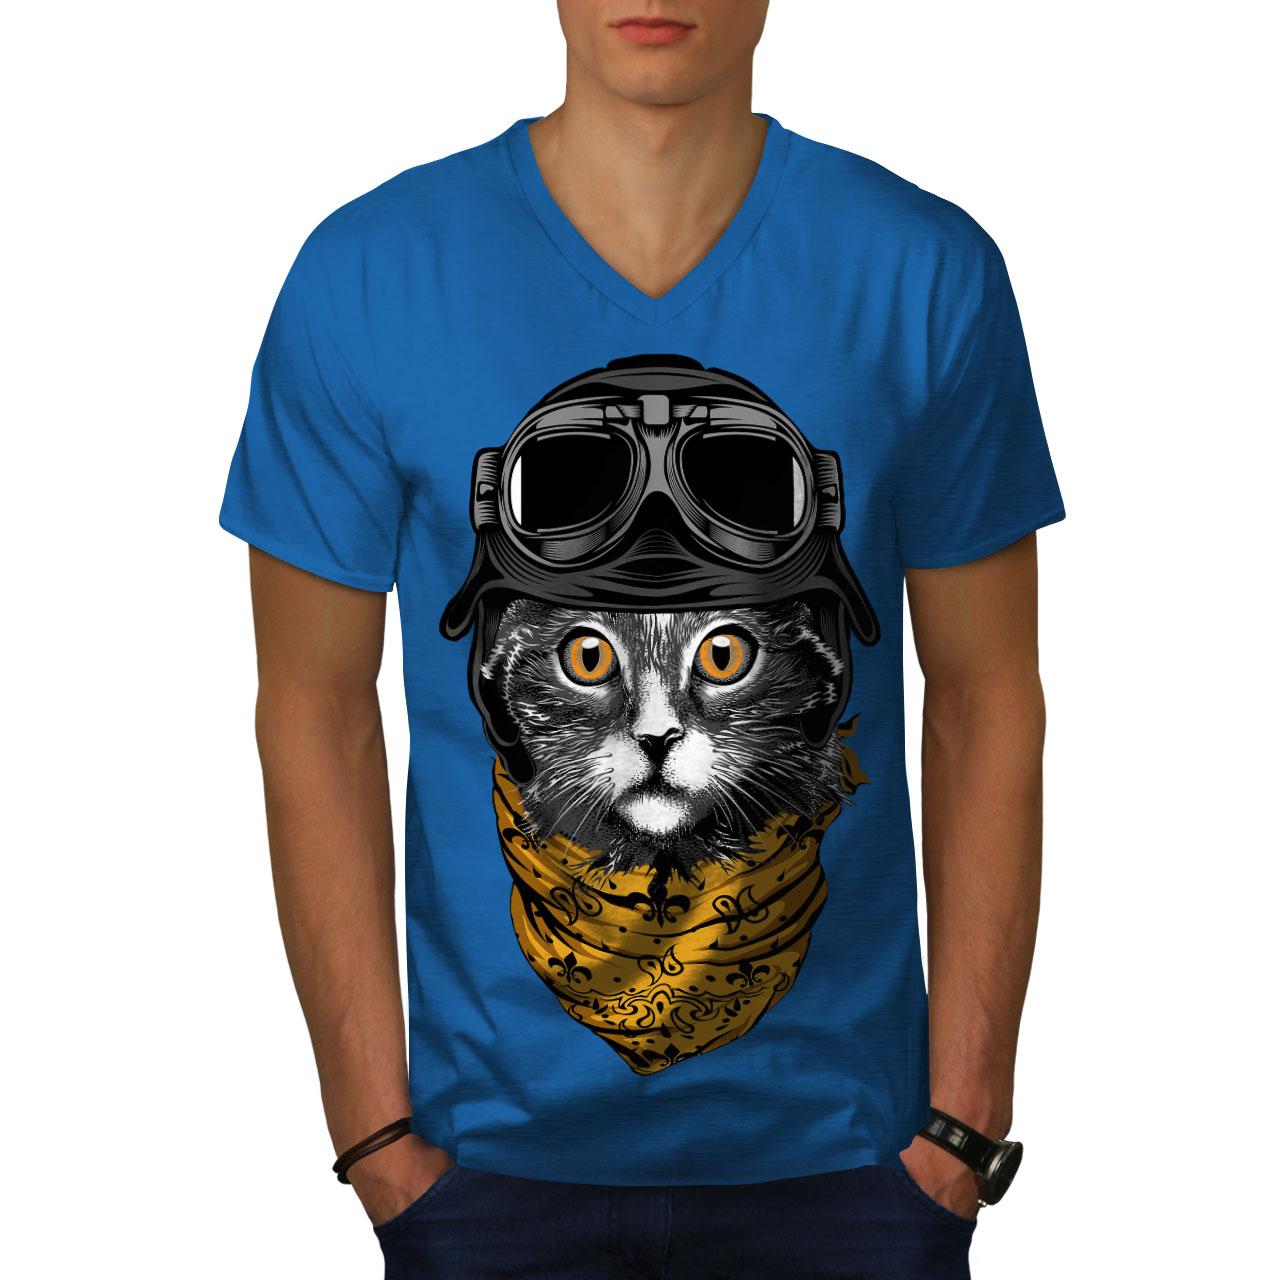 Cat-LINDO-piloto-de-moda-de-hombre-con-cuello-en-V-T-shirt-new-wellcoda